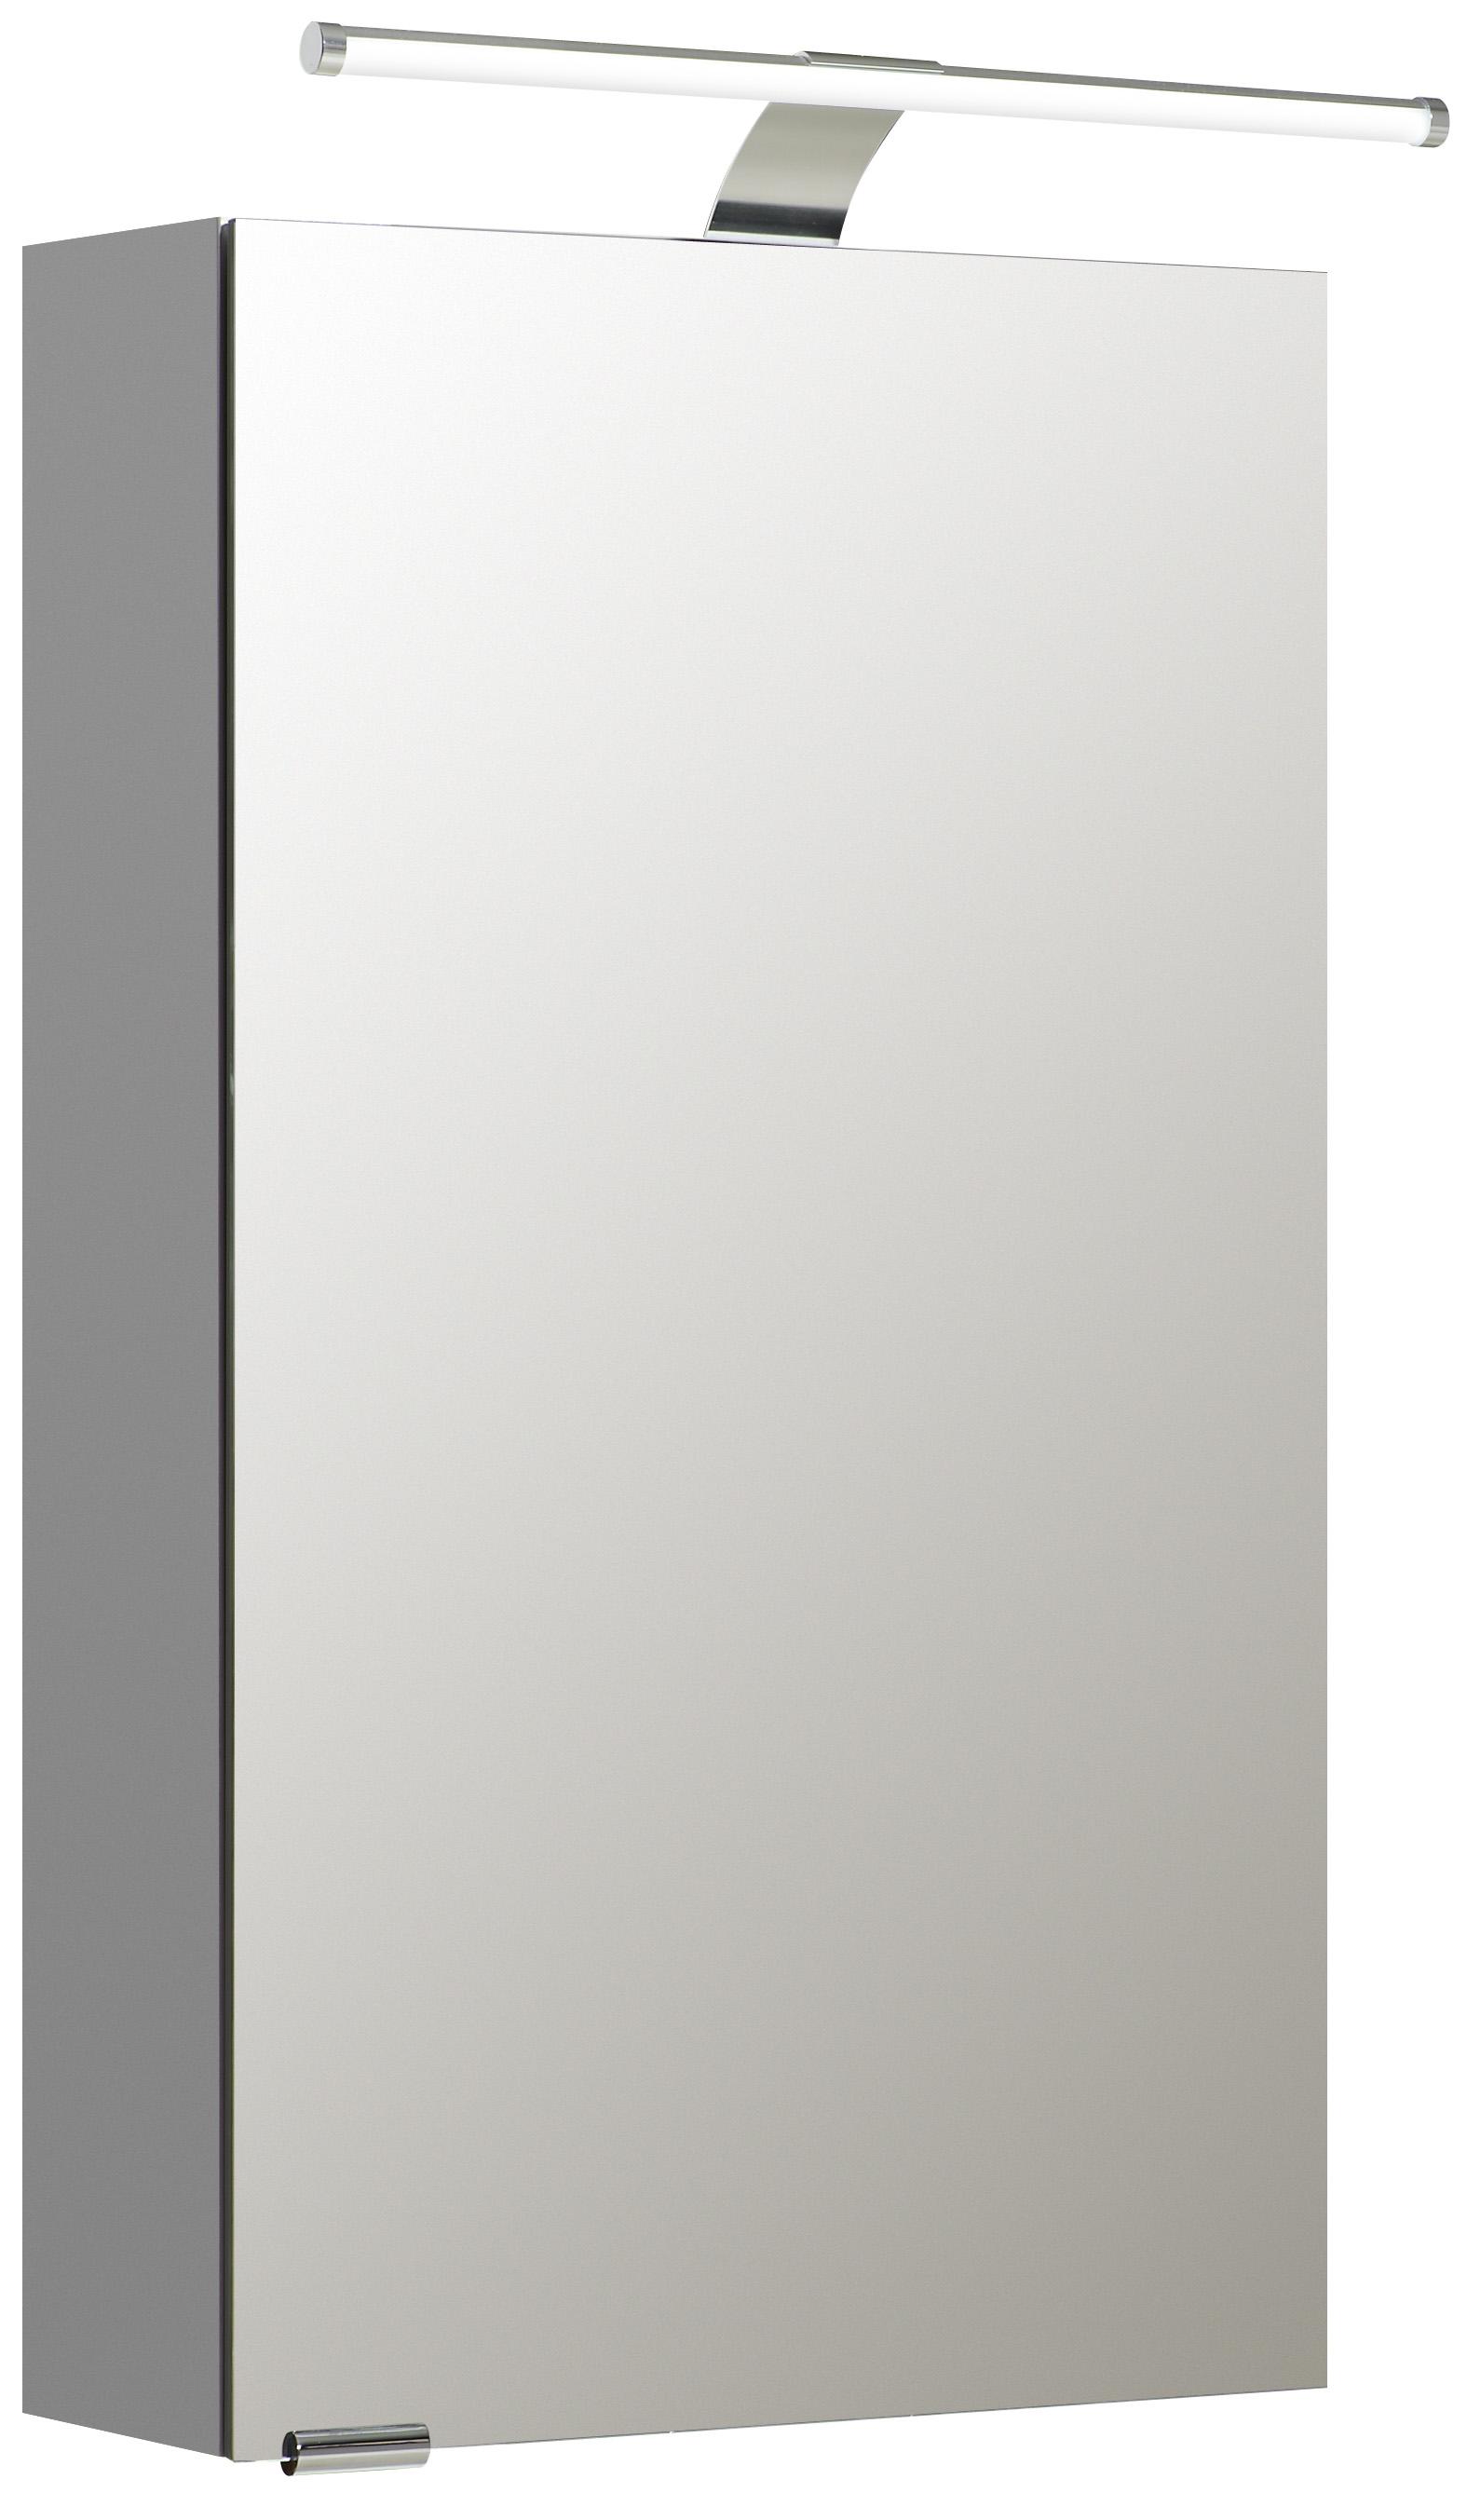 pelipal neutraler spiegelschrank s5 s5 spsd 03 arcom center. Black Bedroom Furniture Sets. Home Design Ideas